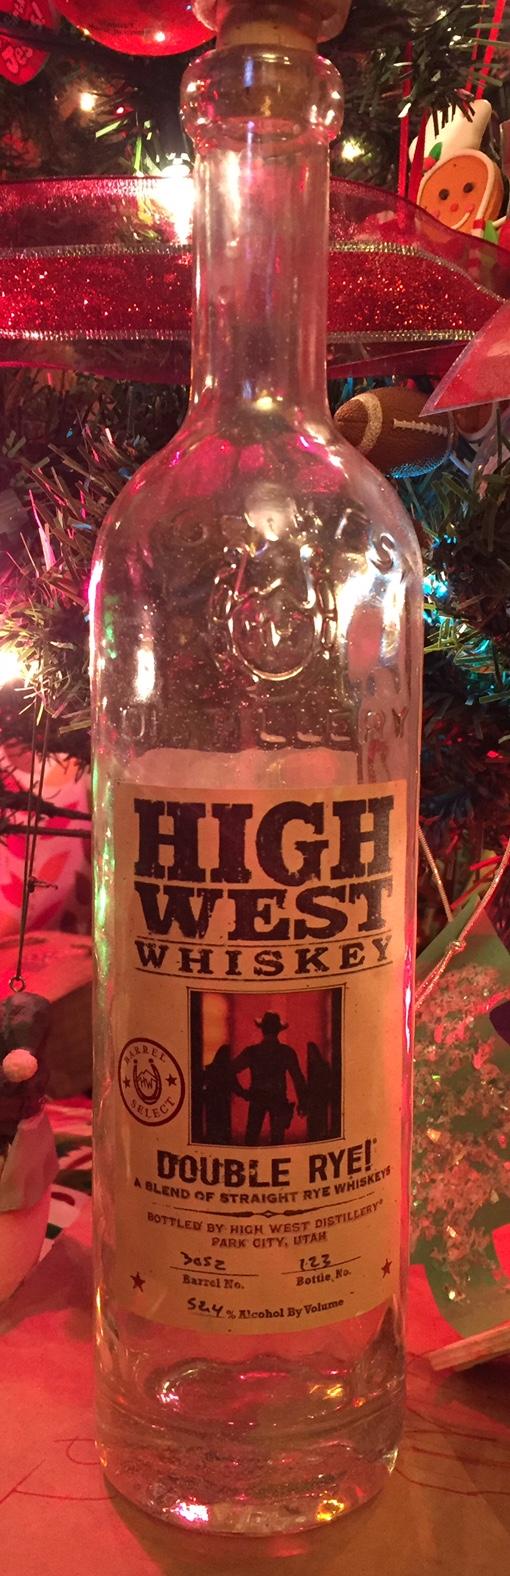 High West Double Rye Quady Black Muscat Finish 2.jpg